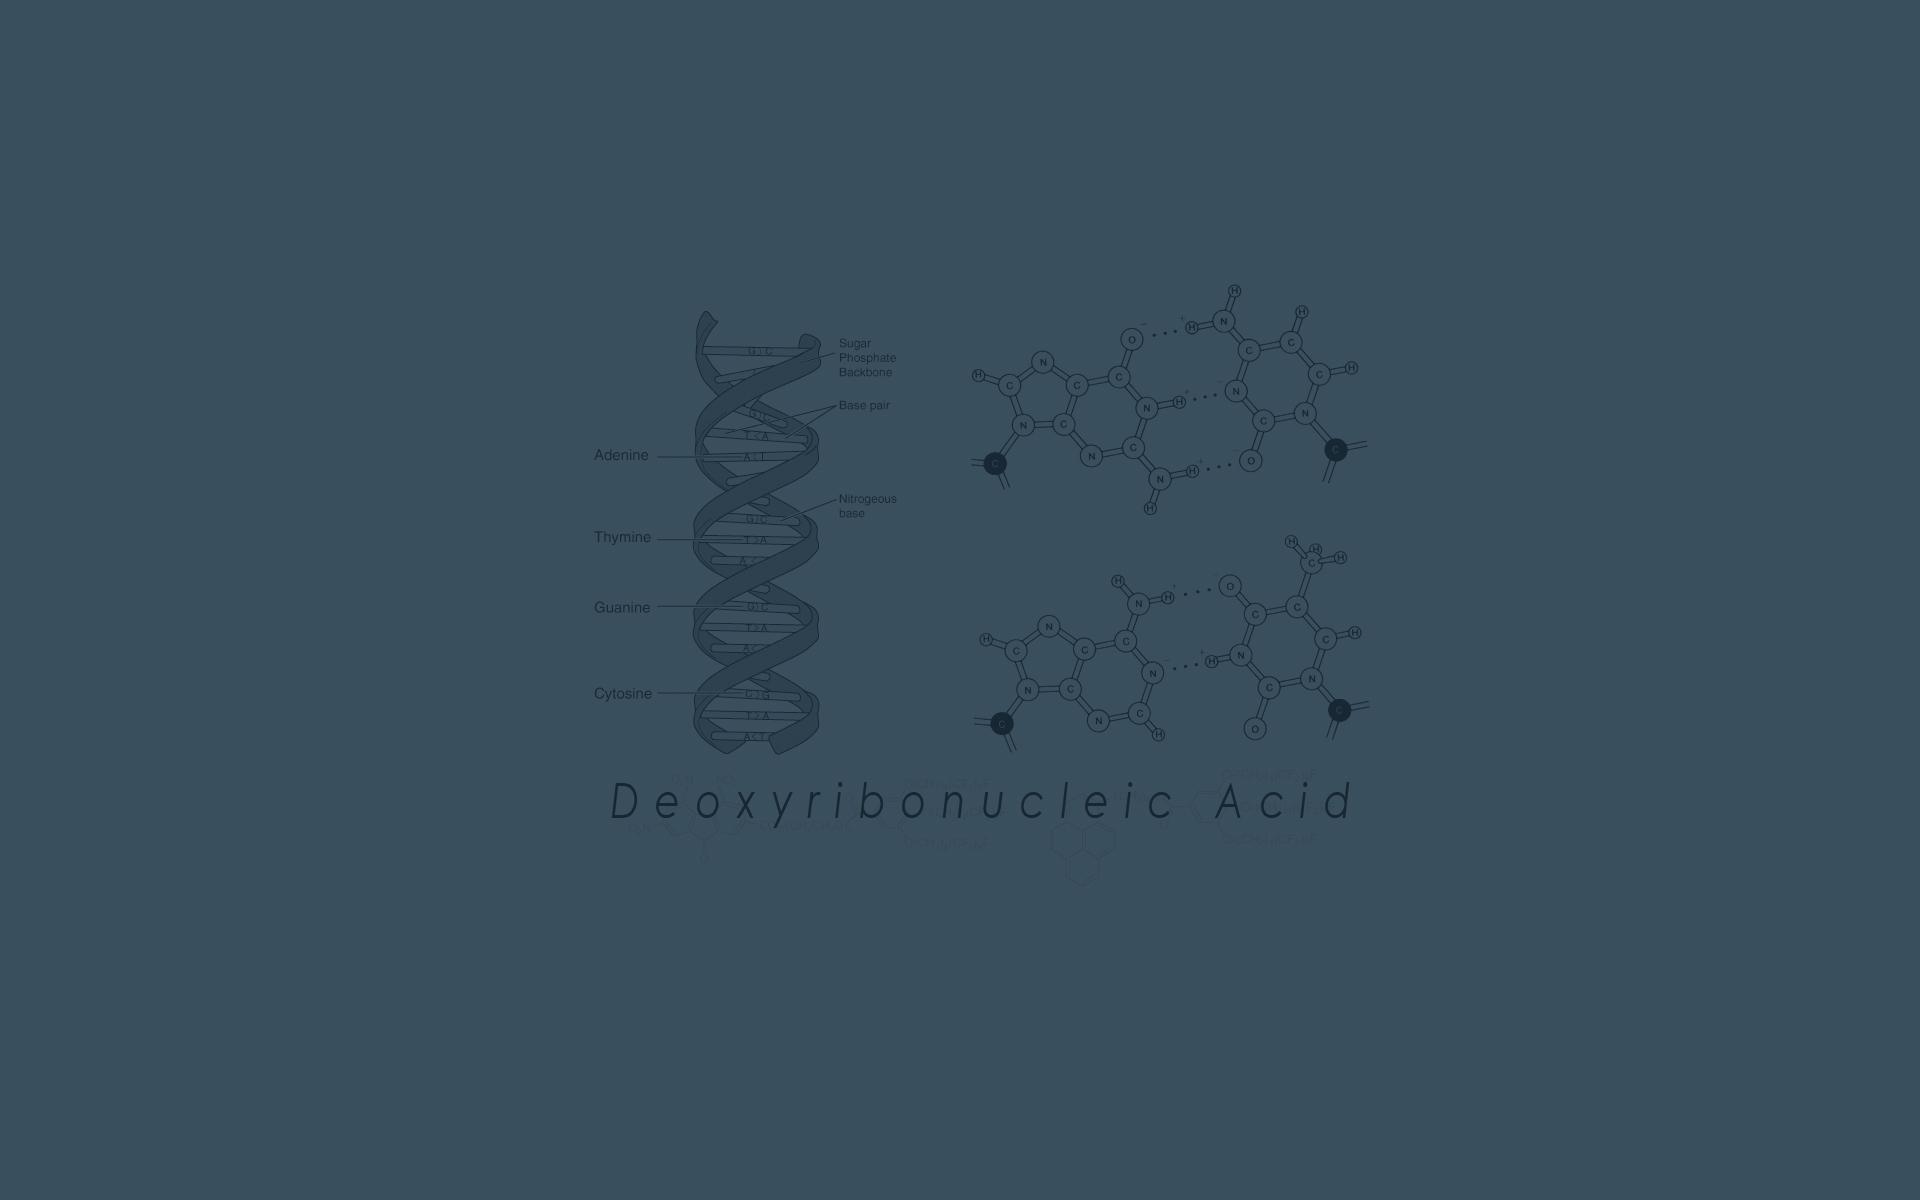 Biology Wallpaper Background - WallpaperSafari | 1920 x 1200 jpeg 113kB